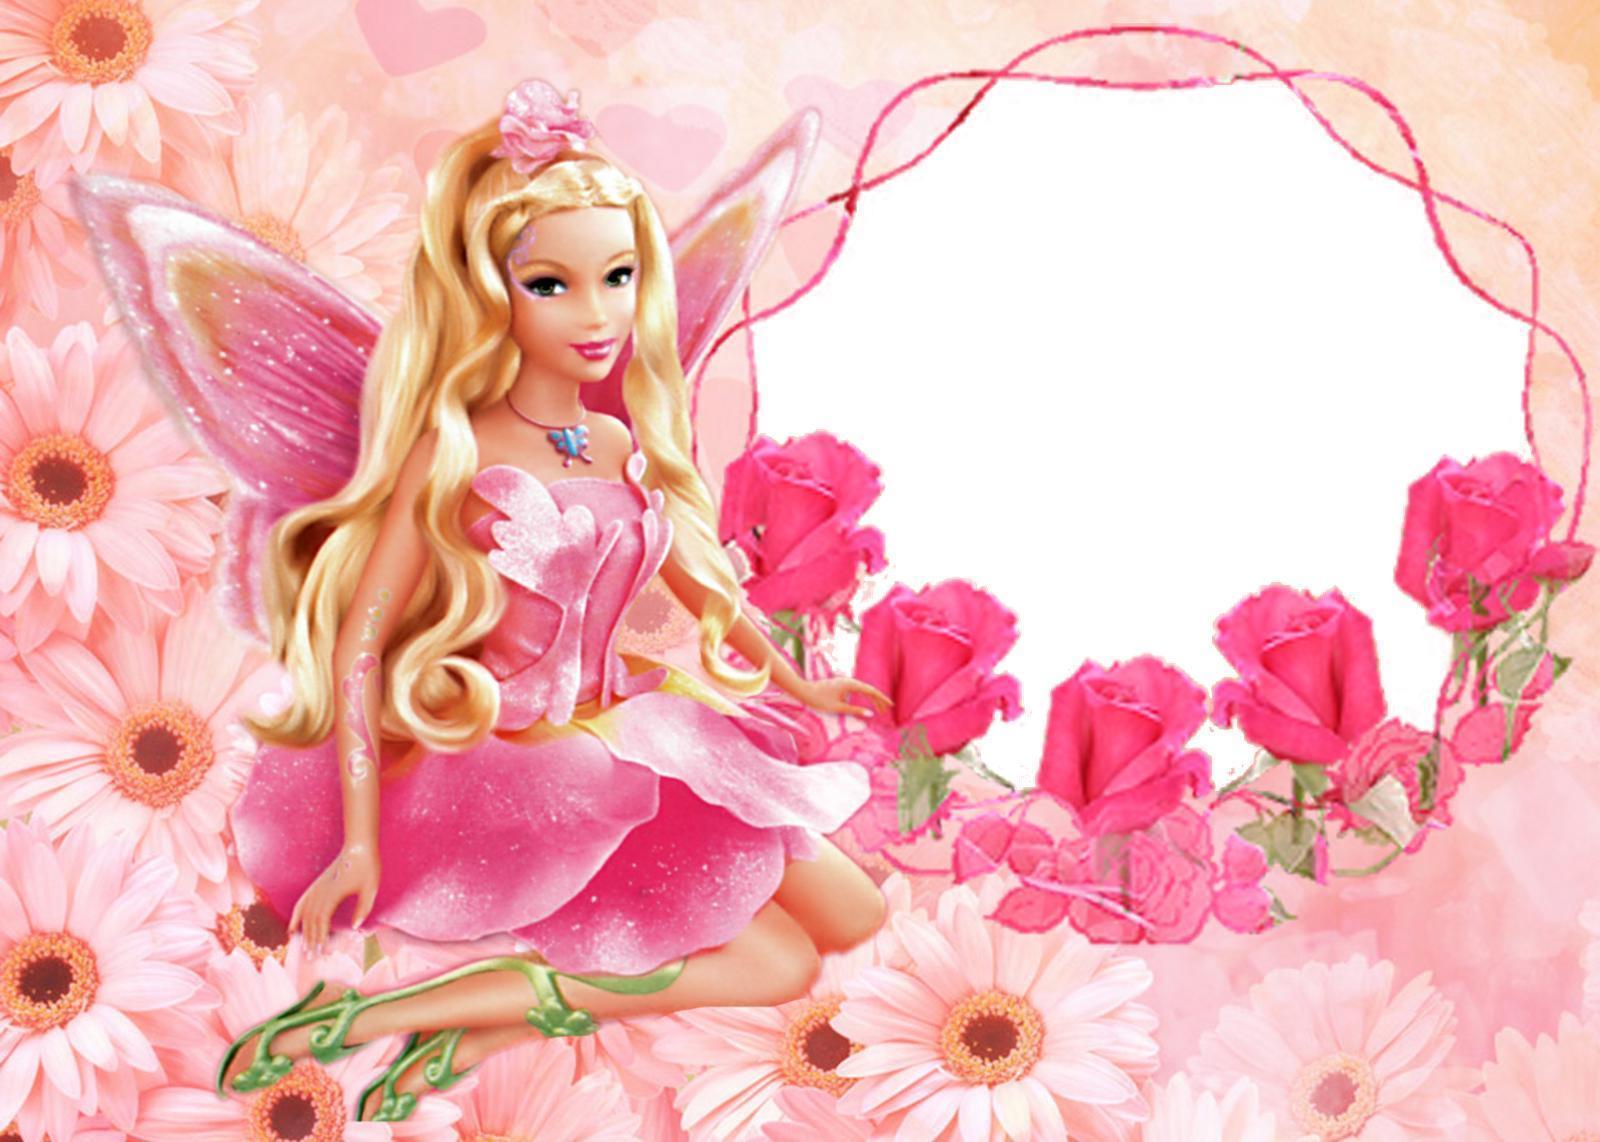 Barbie Pink Fullscreen Wallpaper - Barbie Background For Birthday , HD Wallpaper & Backgrounds